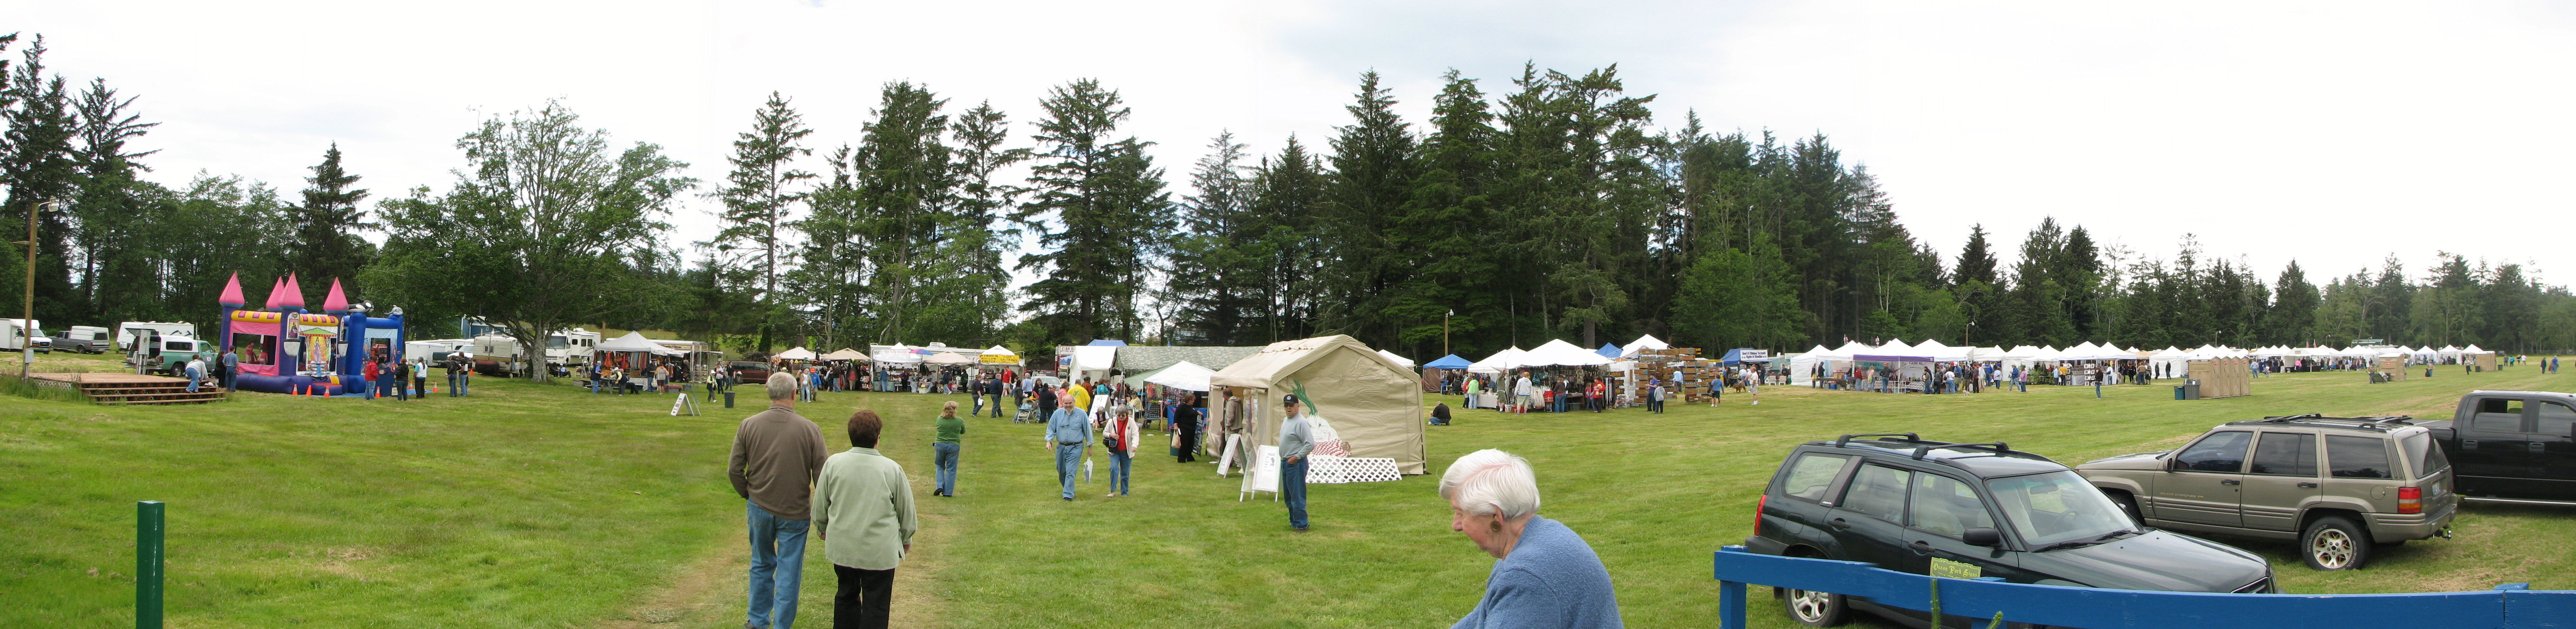 Northwest Garlic Festival - festival view in field